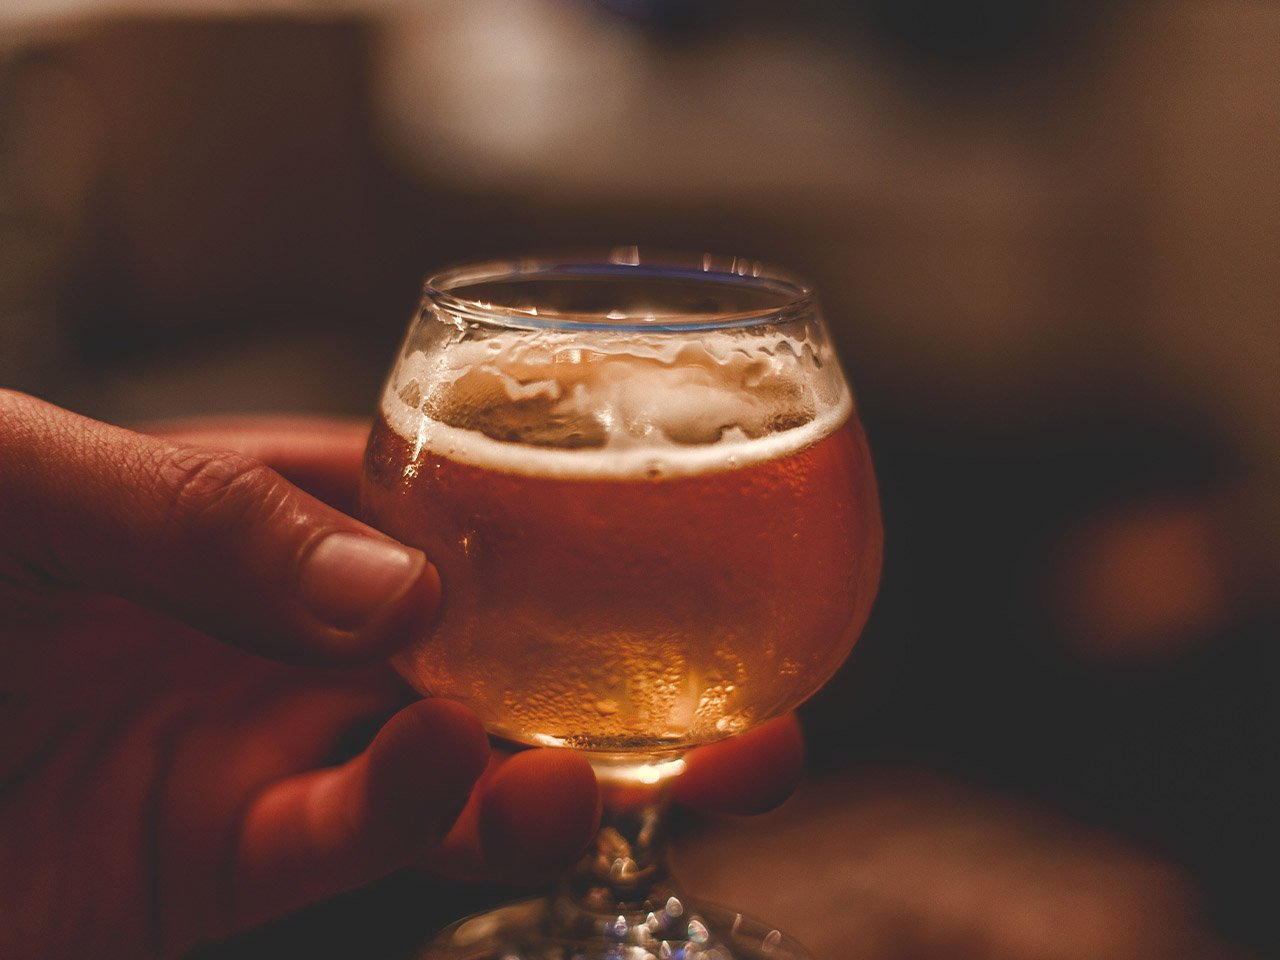 Pelion-Homes-beer-brewing-experience-2